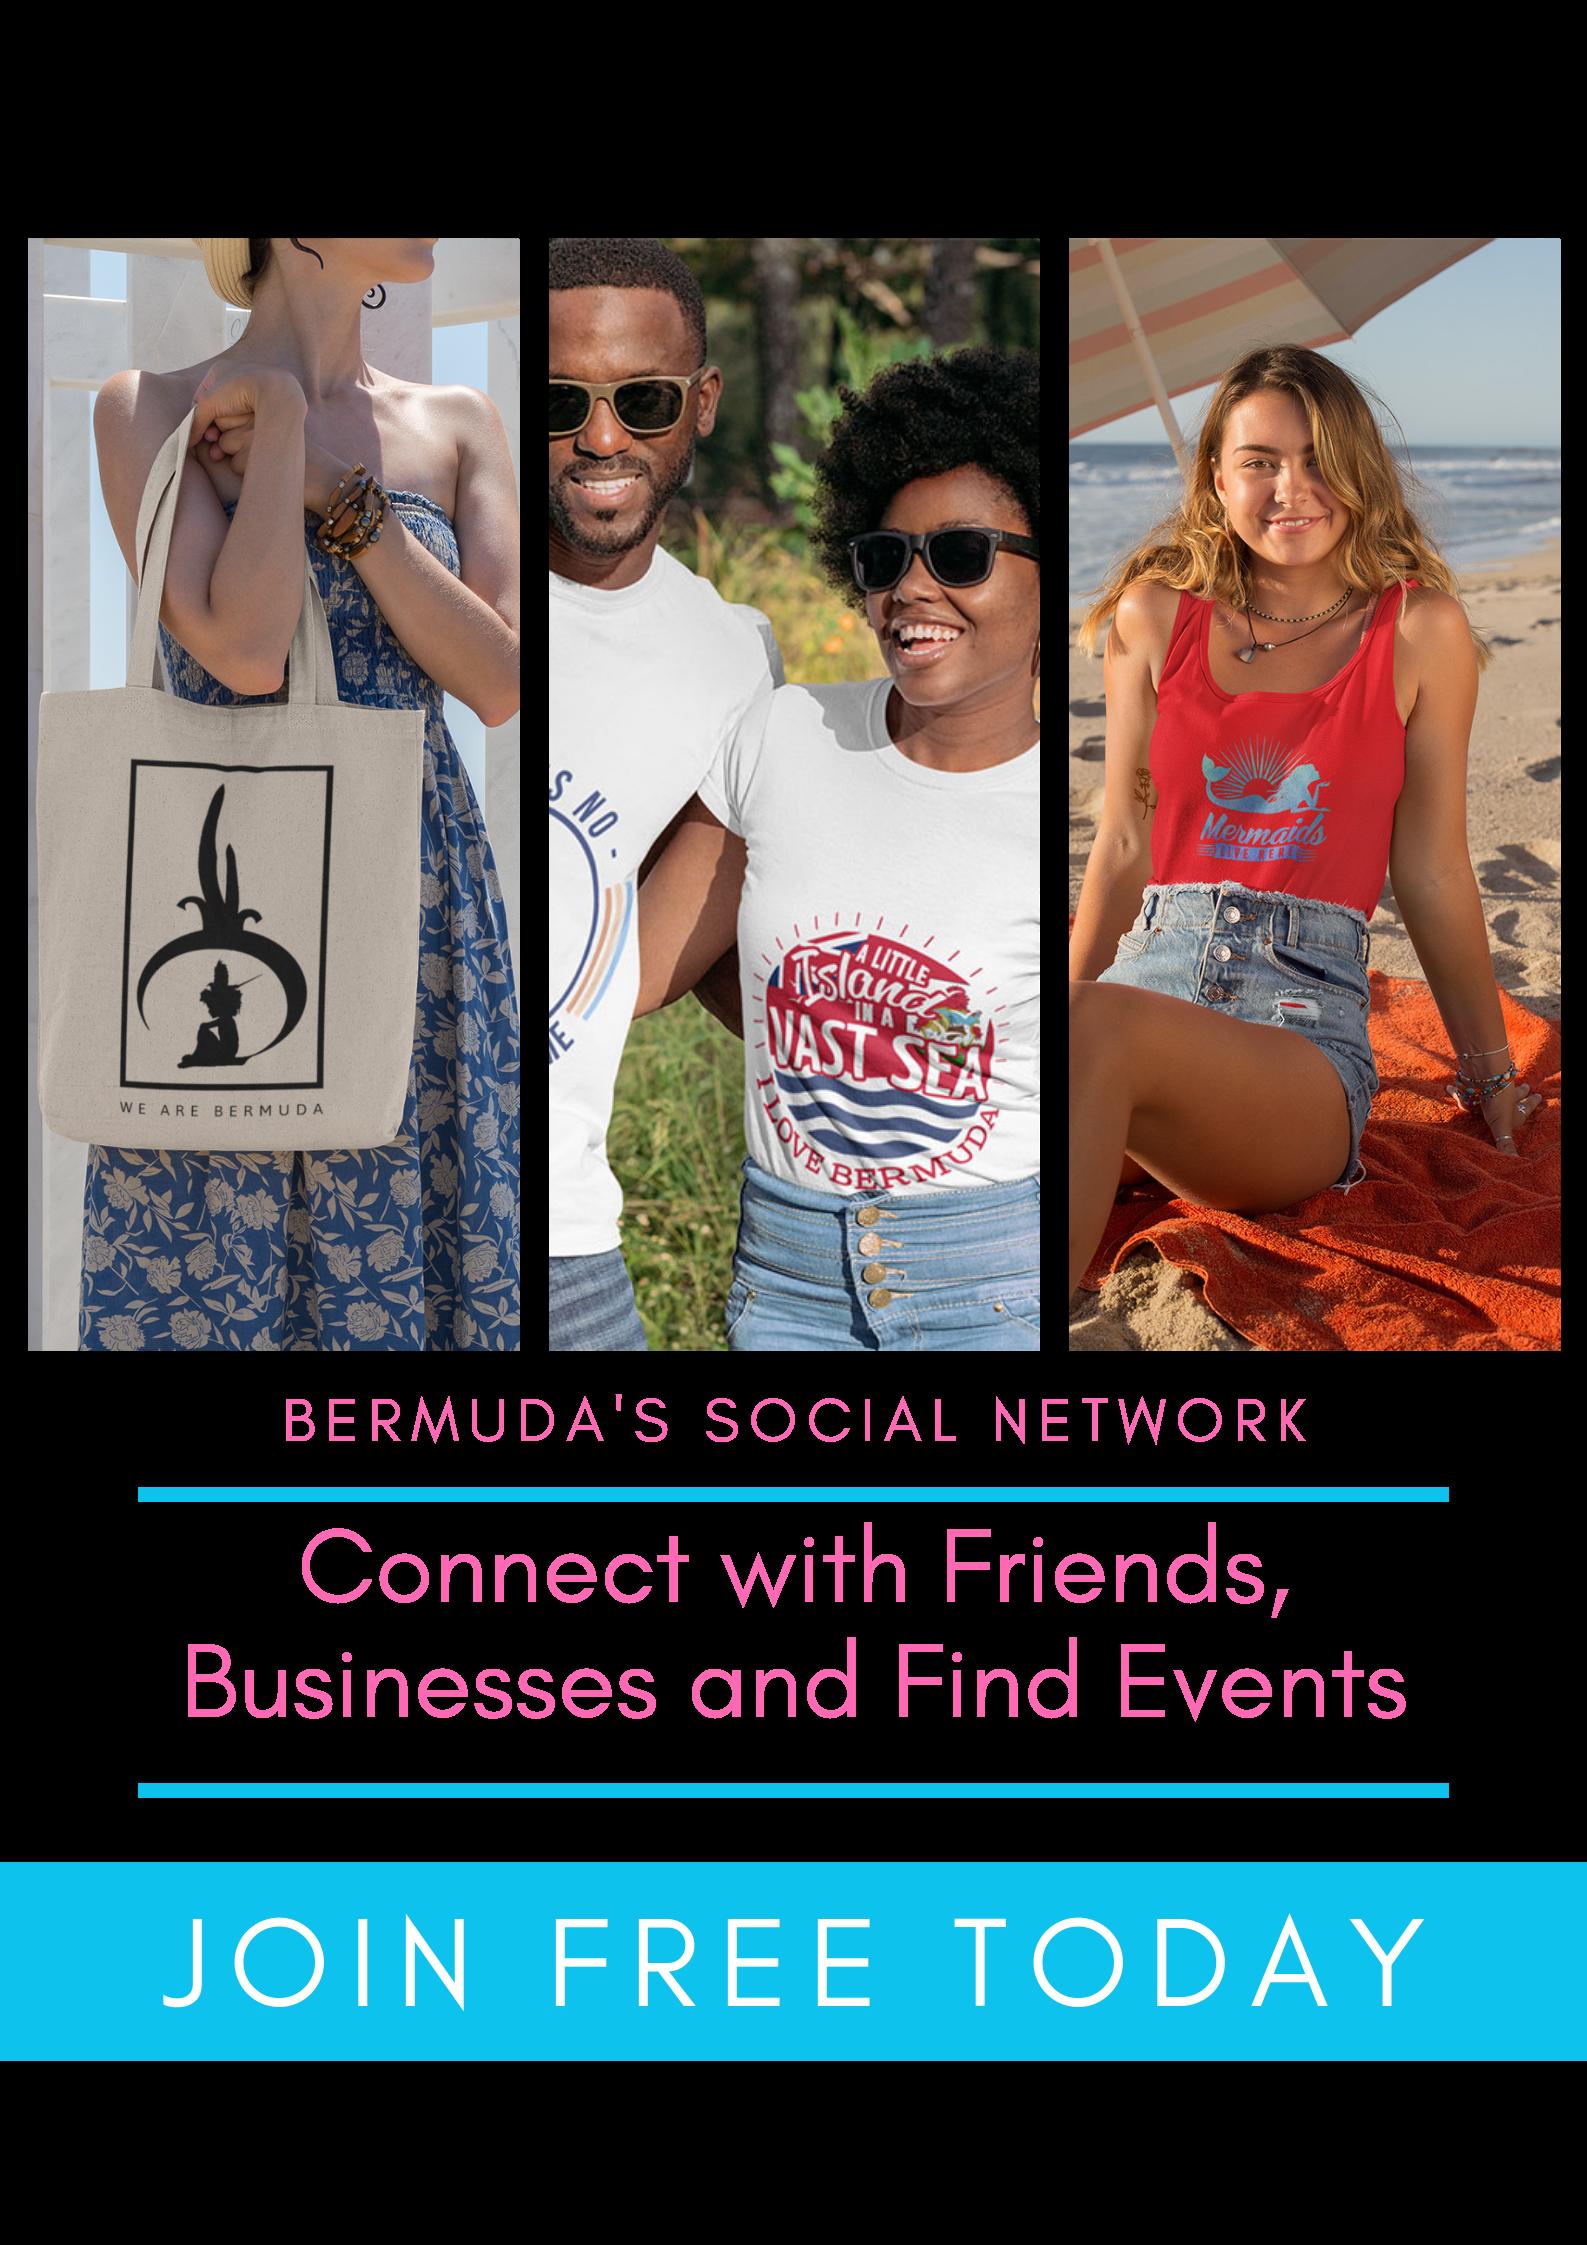 Bermuda's Social Network